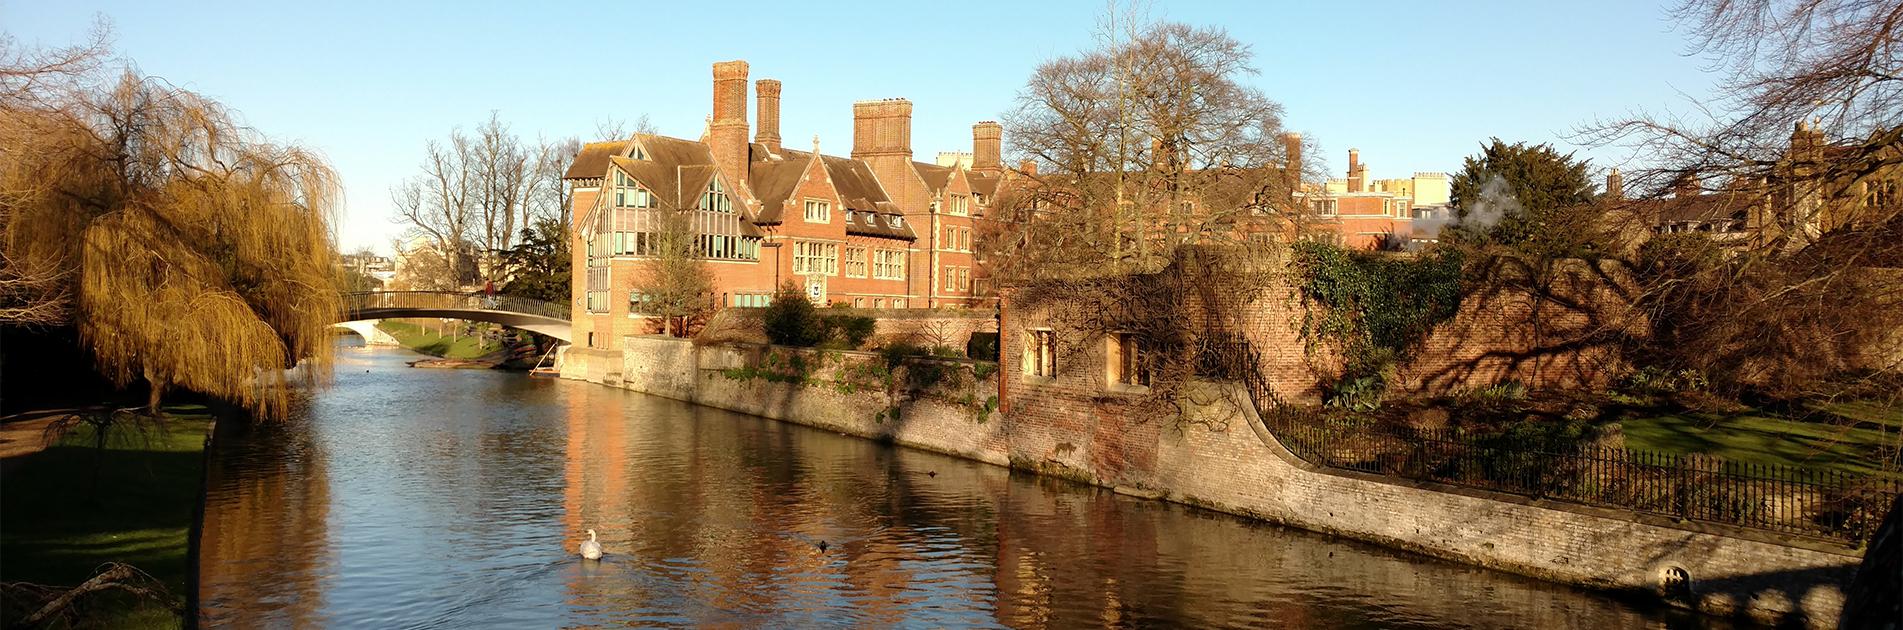 Kanal ved Cambridge